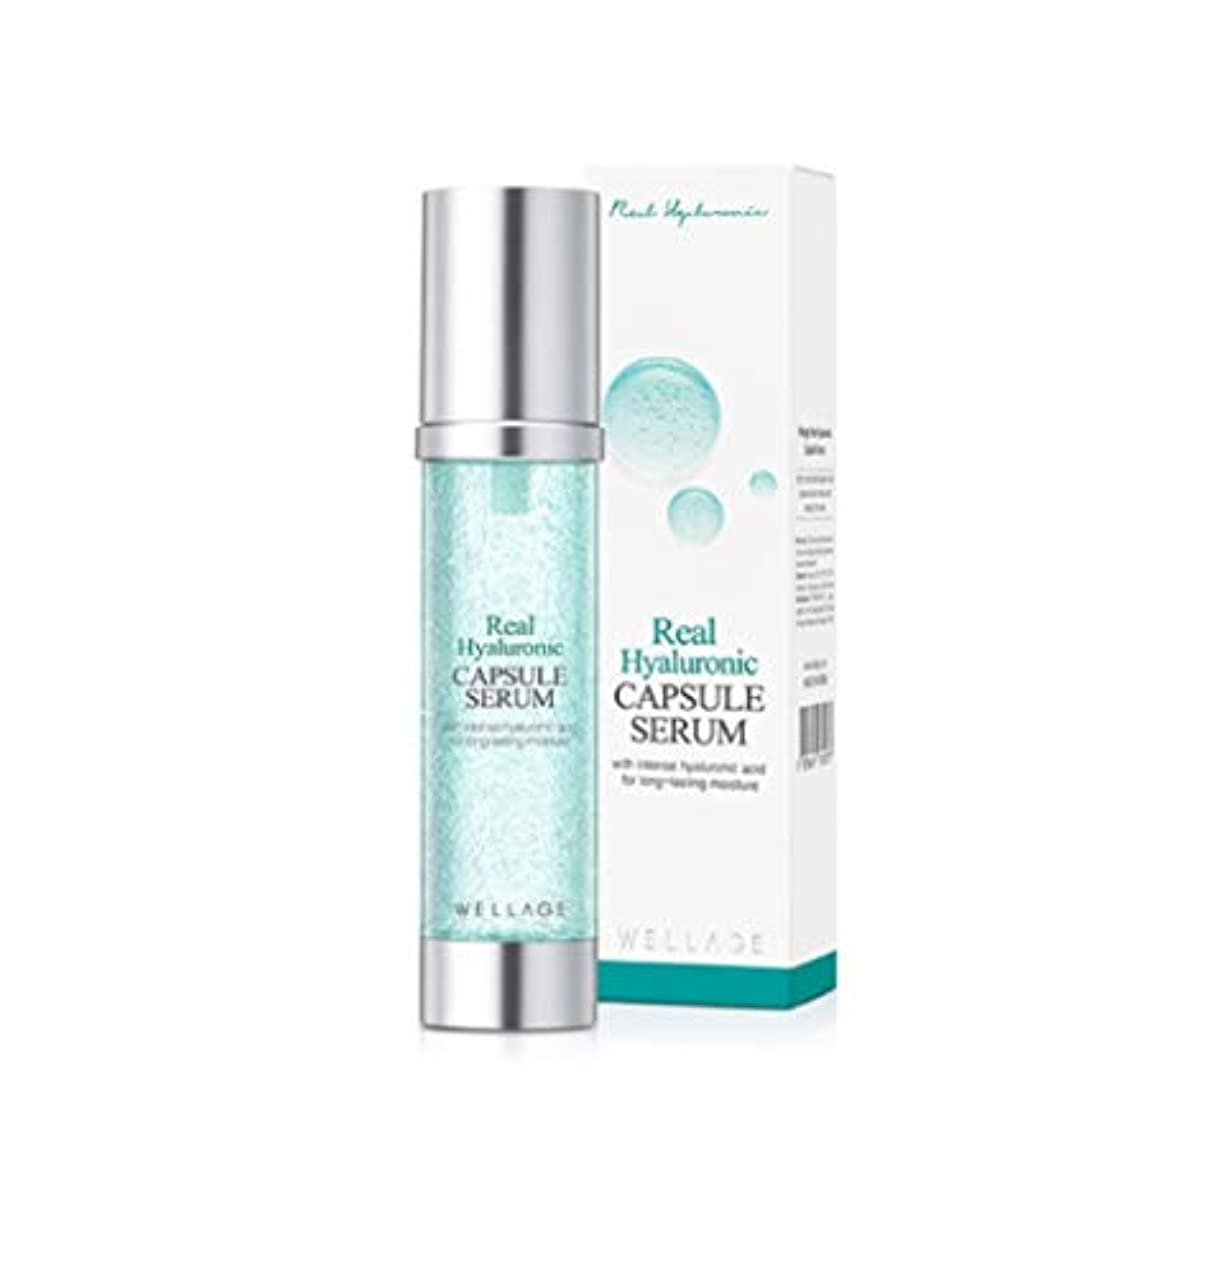 WELLAGE(ウェラージュ) リアルヒアルロン酸カプセル血清 50ml / Real Hyaluronic Capsule Serum (Korea Beautyの持続的な水分補給)